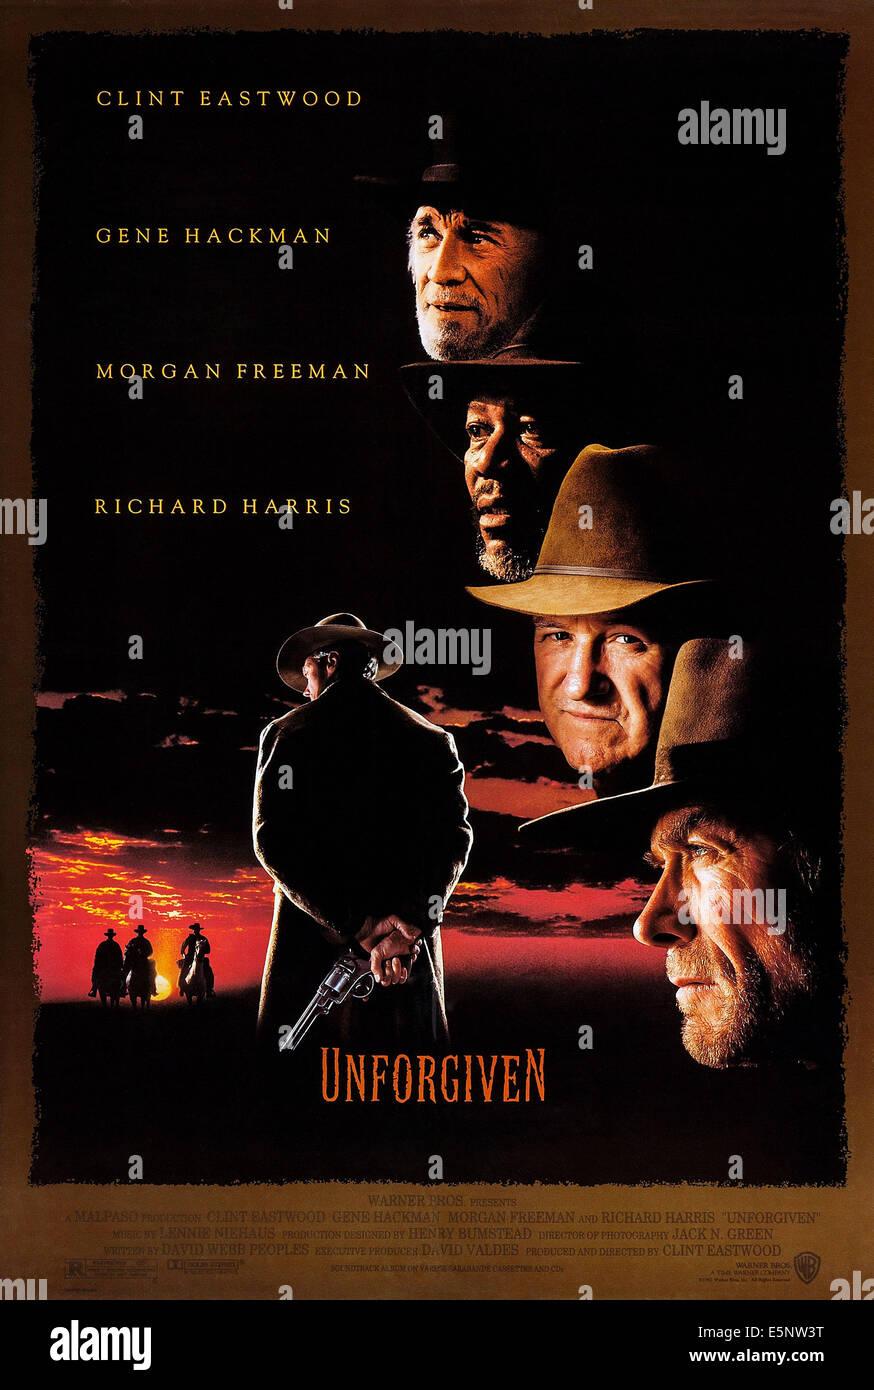 UNFORGIVEN, US poster art, Richard Harris, Morgan Freeman, Gene Hackman, Clint Eastwood, 1992 - Stock Image